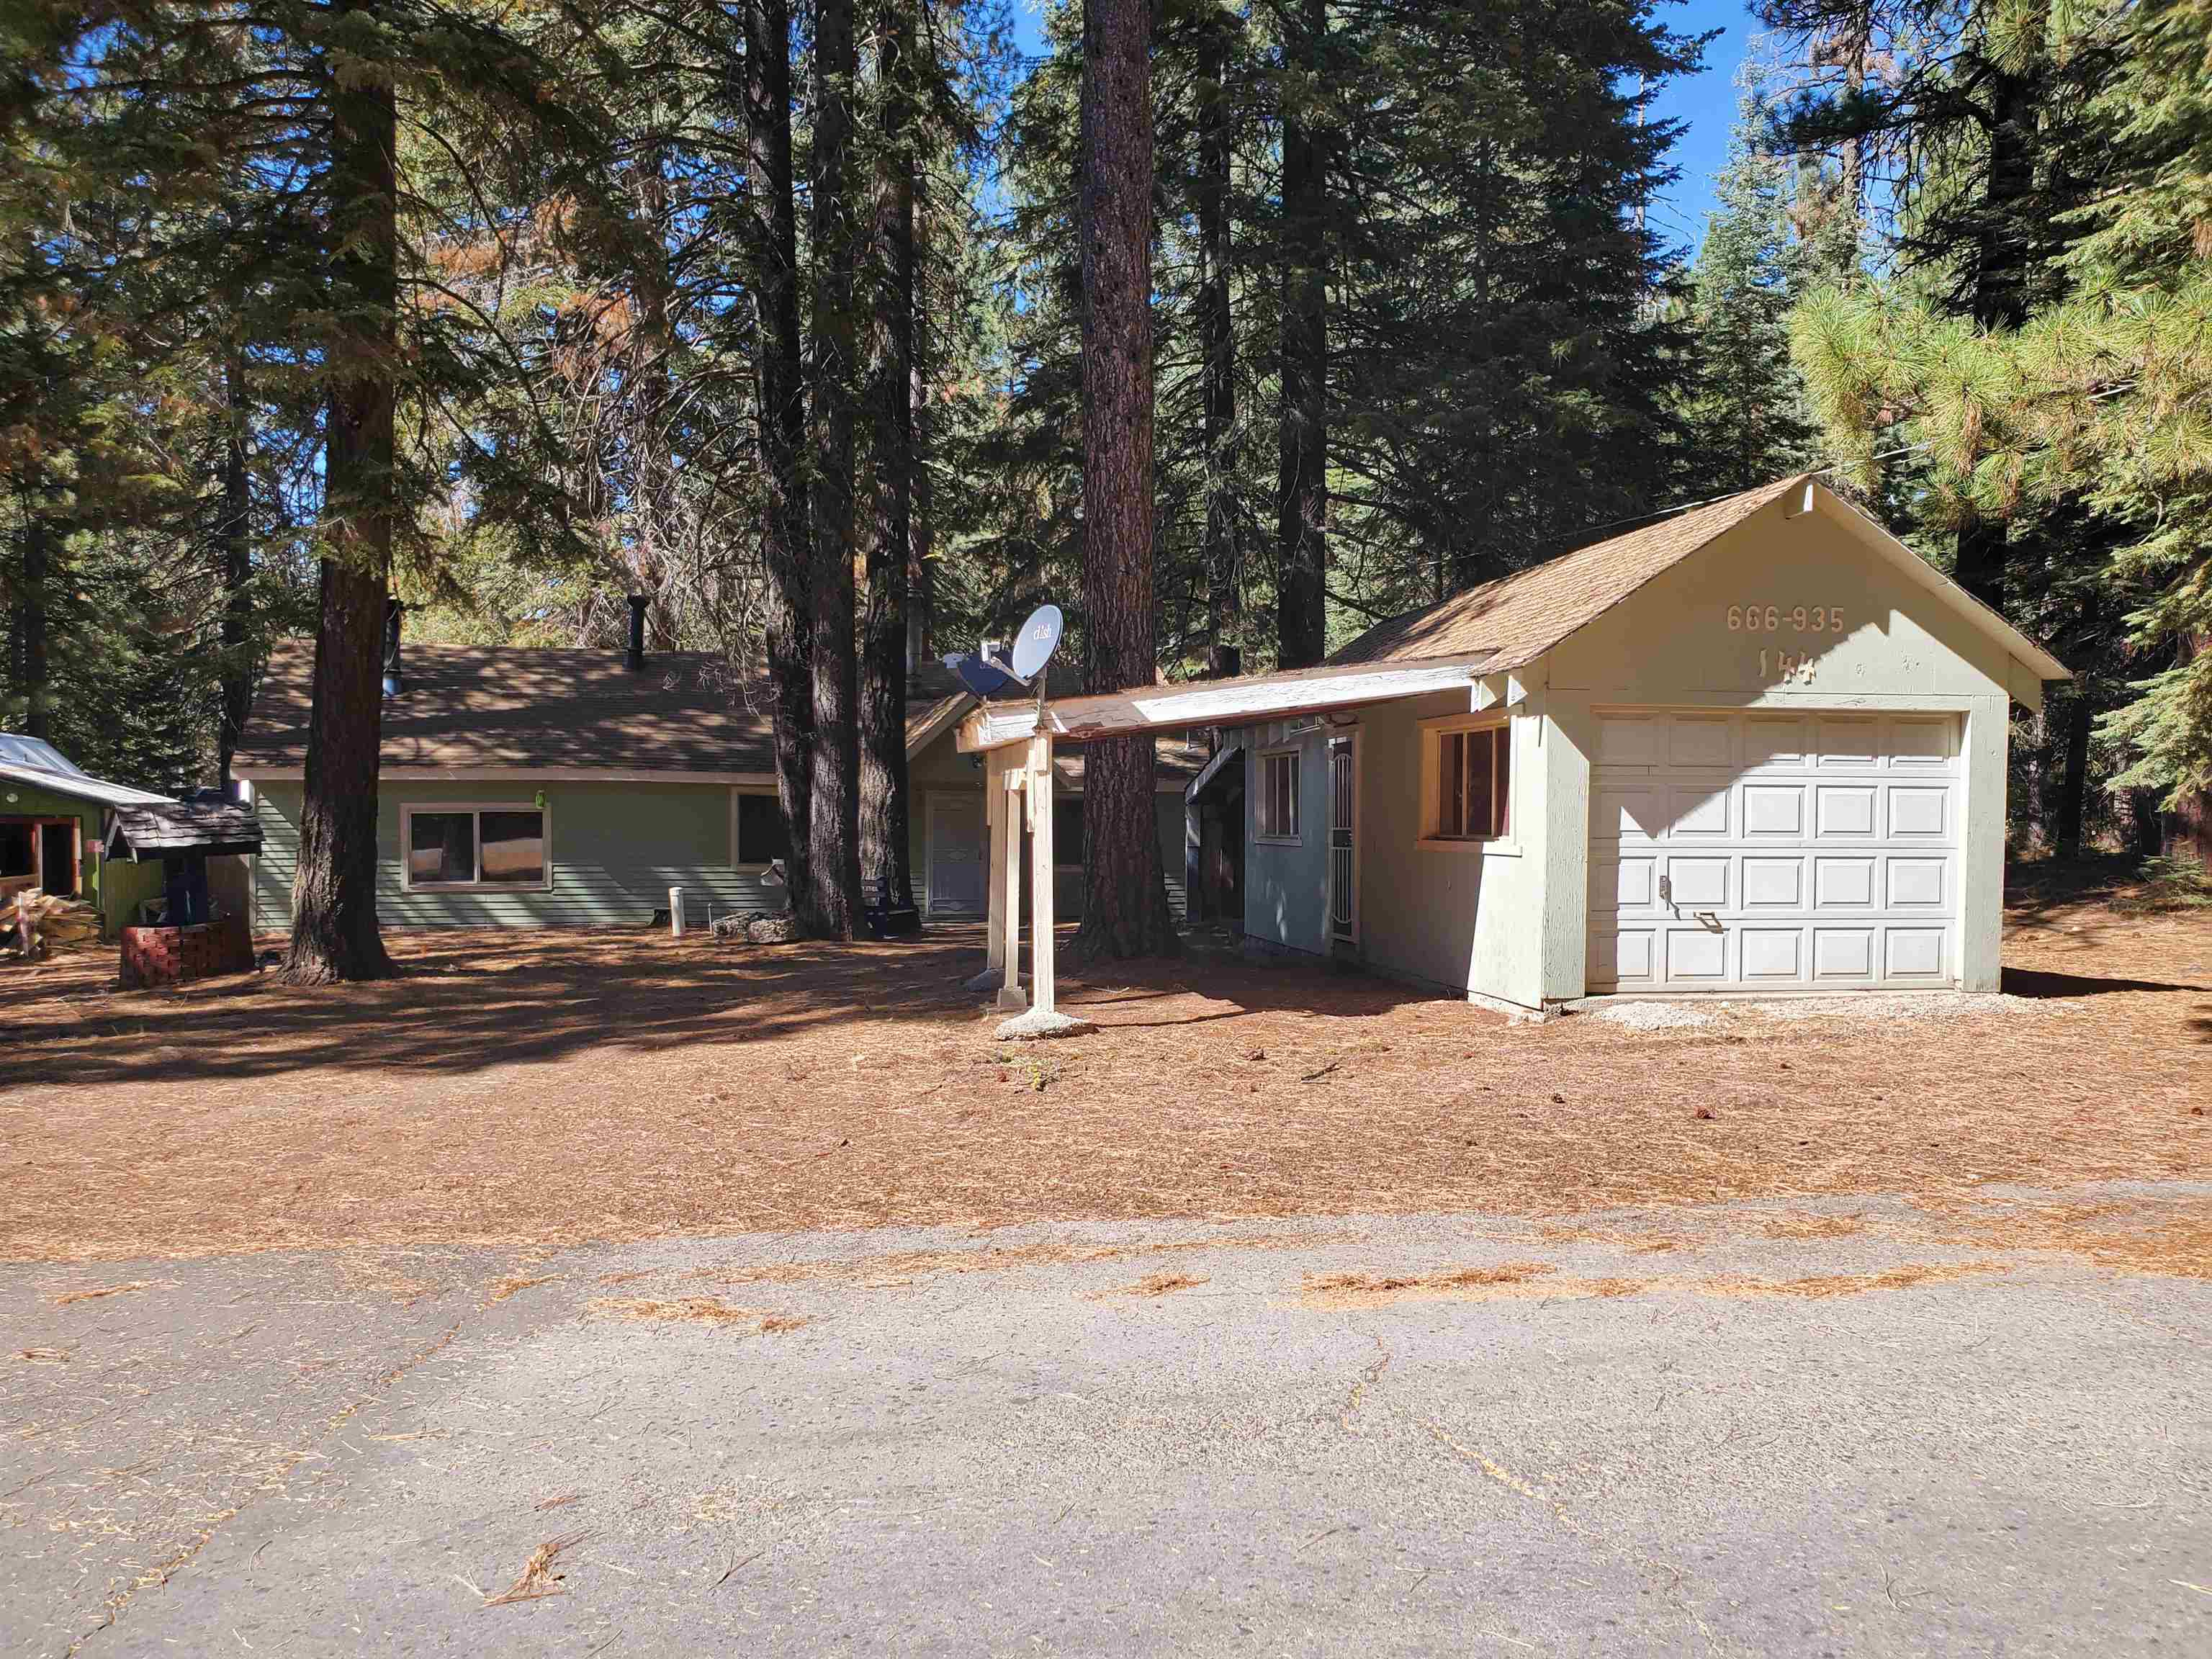 666-935 Spring Creek Drive, Clear Creek, CA 96137